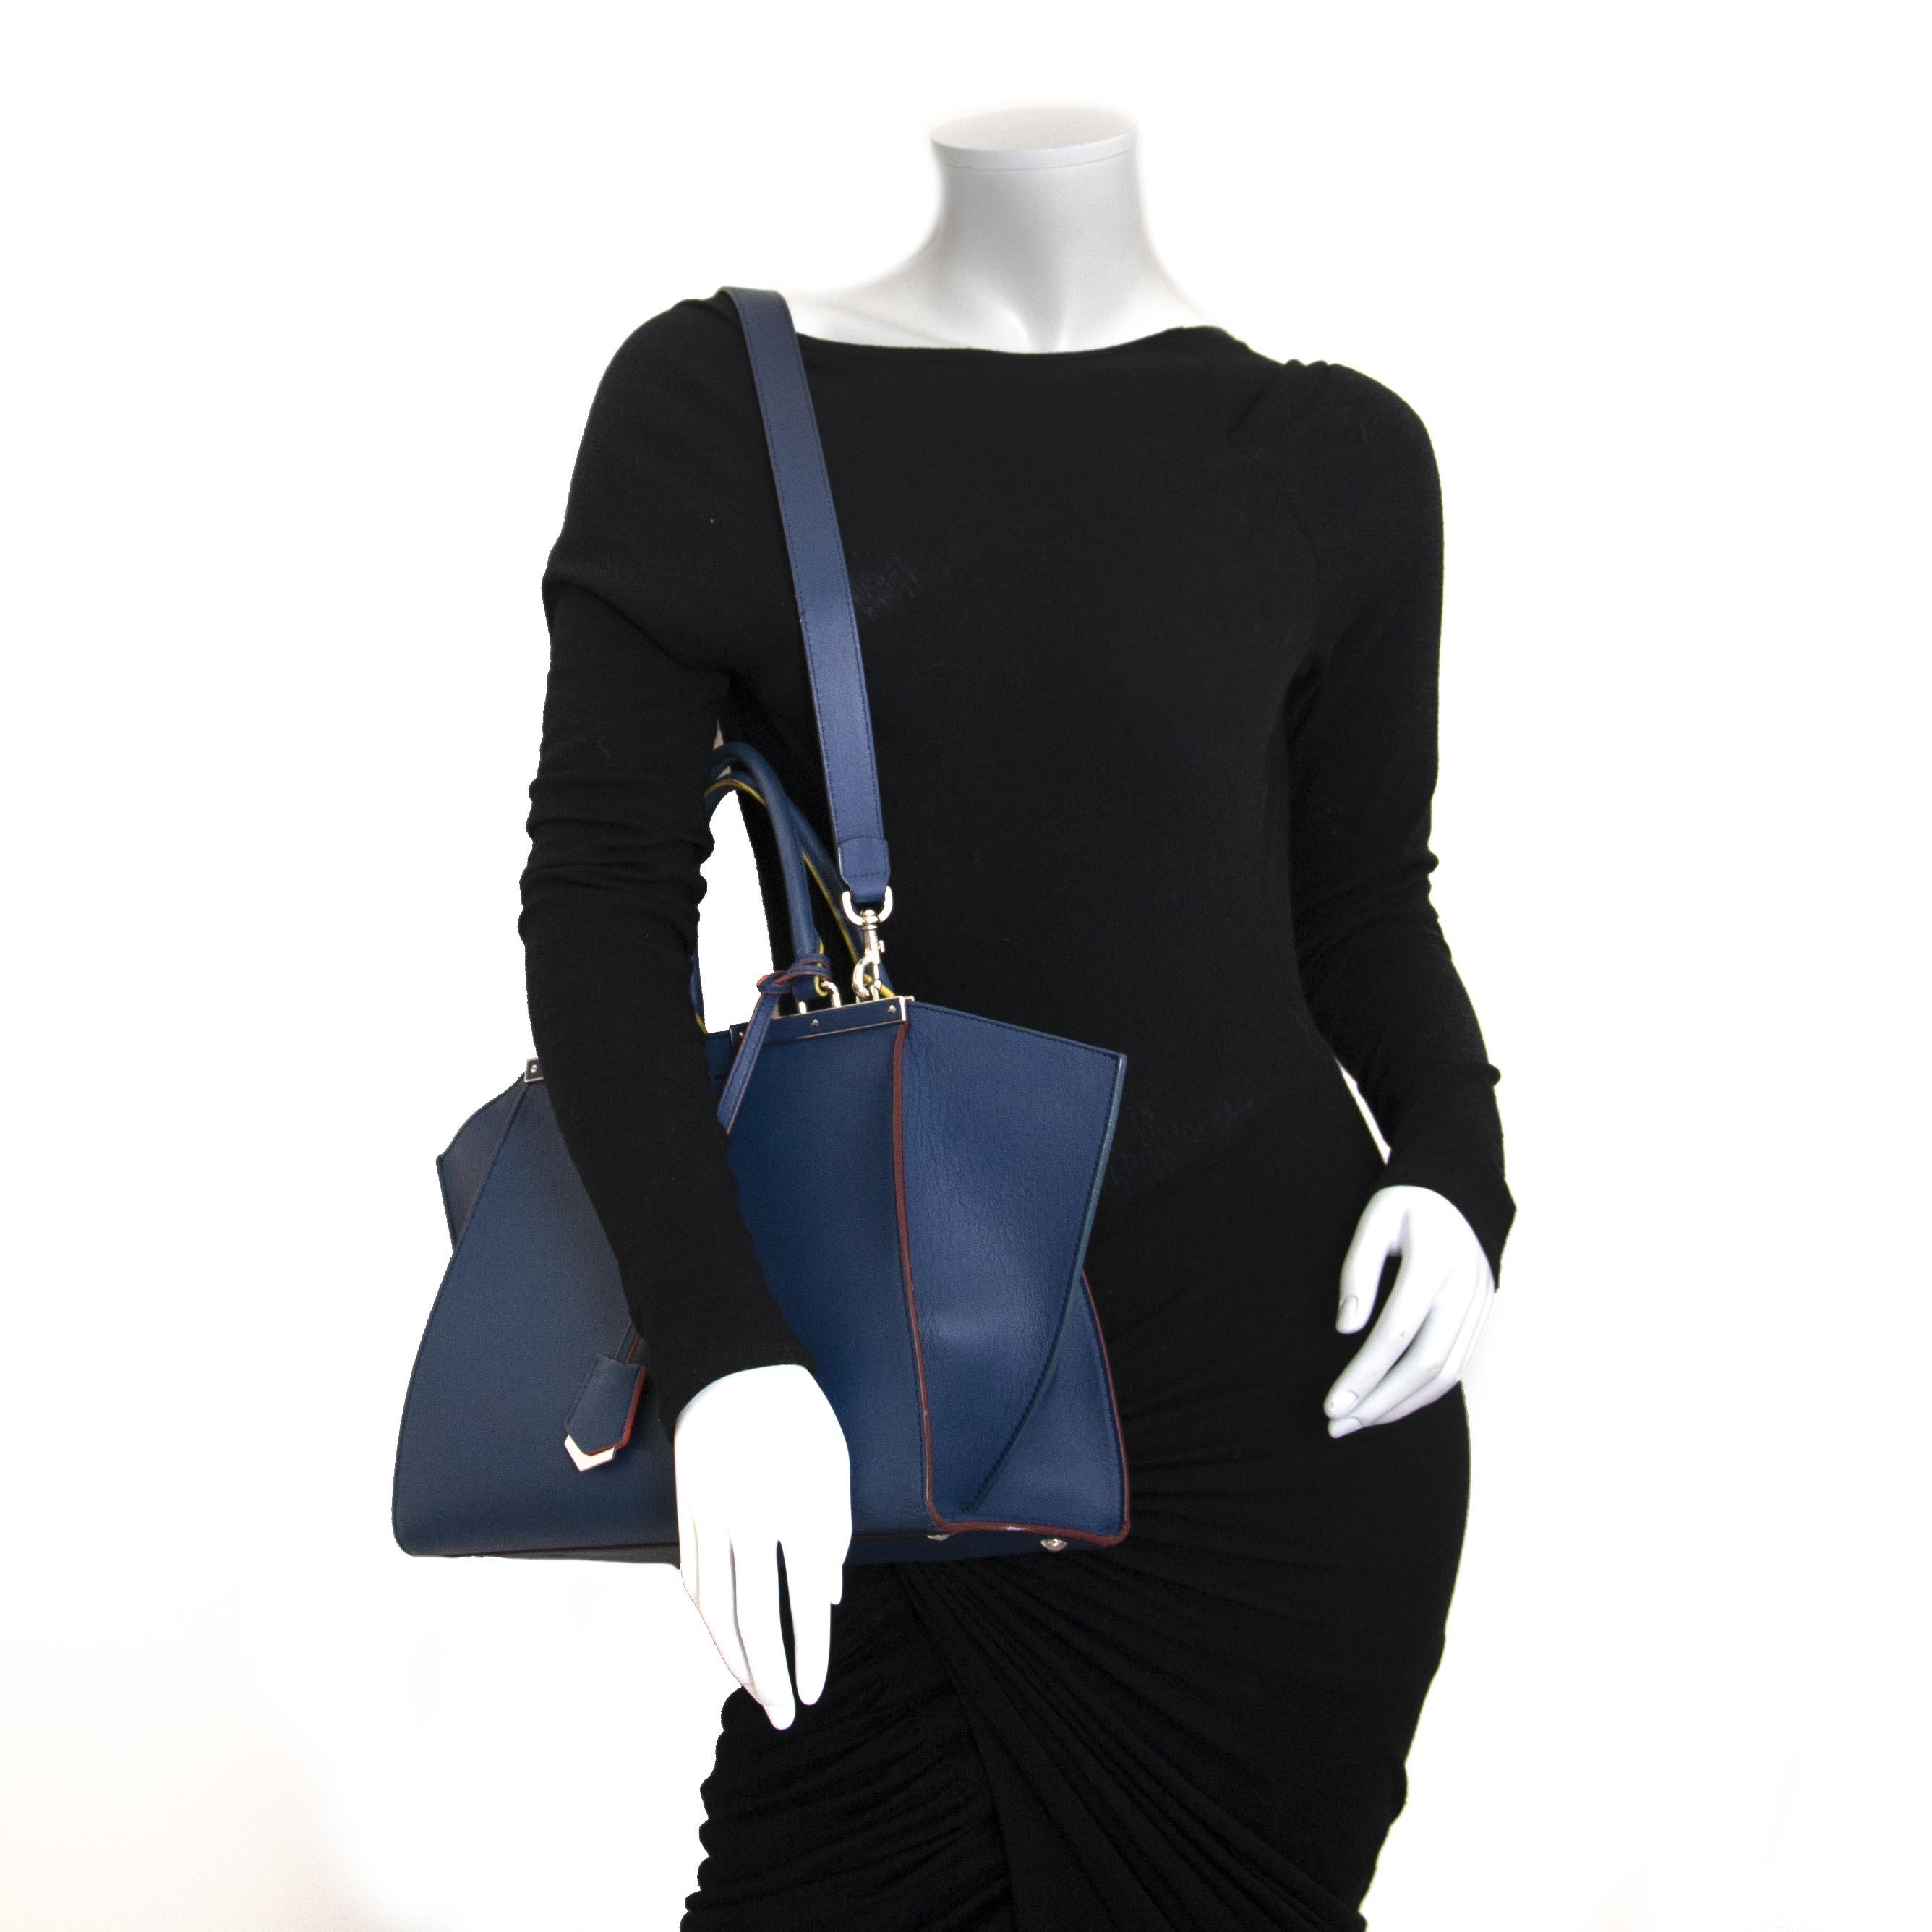 Fendi 3Jours Medium Tote Bag now for sale at labellov vintage fashion webshop belgium